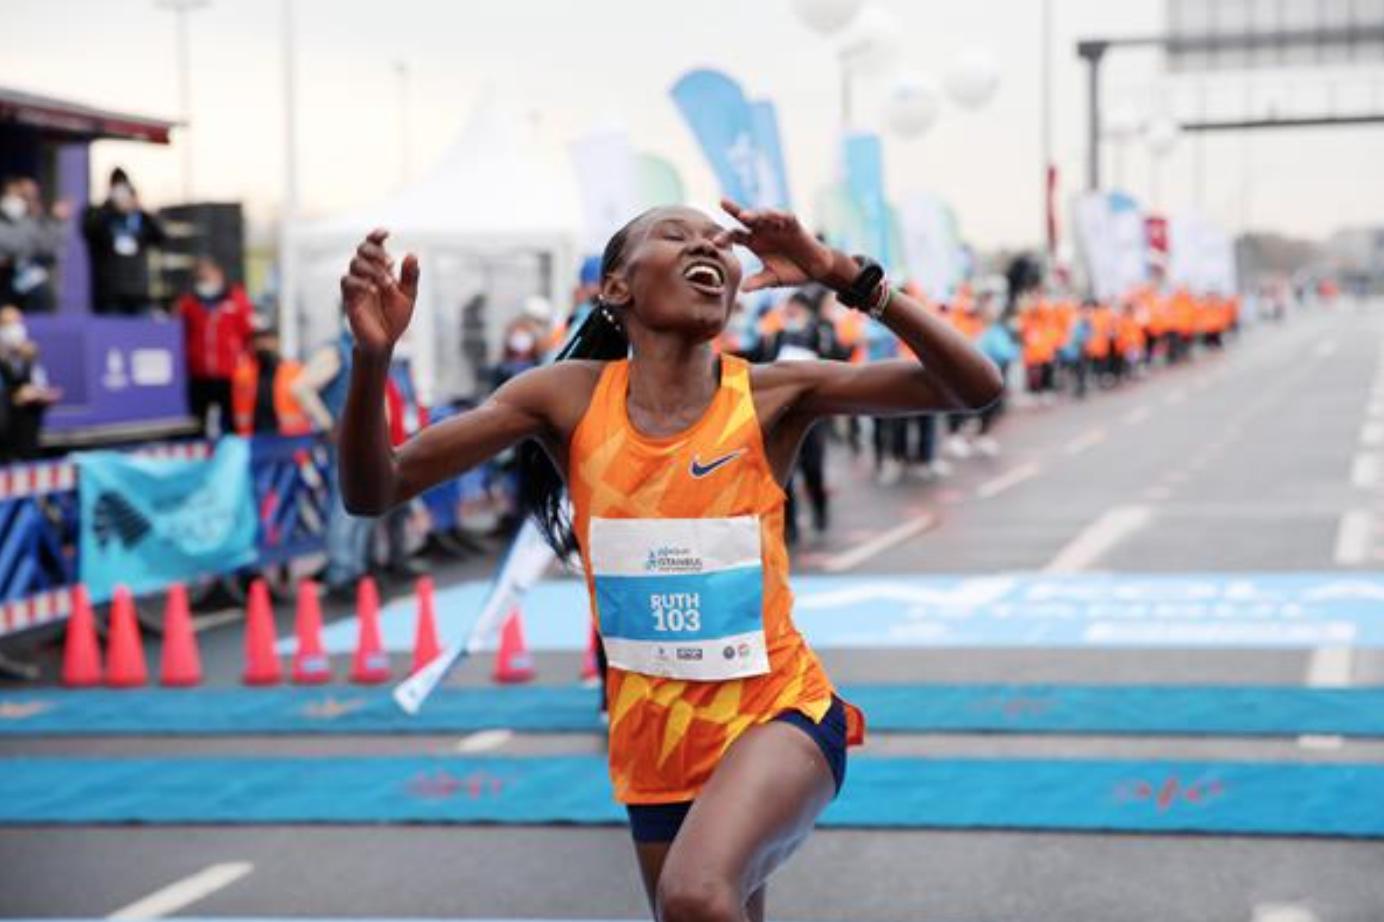 Ruth Chepngetich quebra o recorde mundial de meia maratona, em Istambul